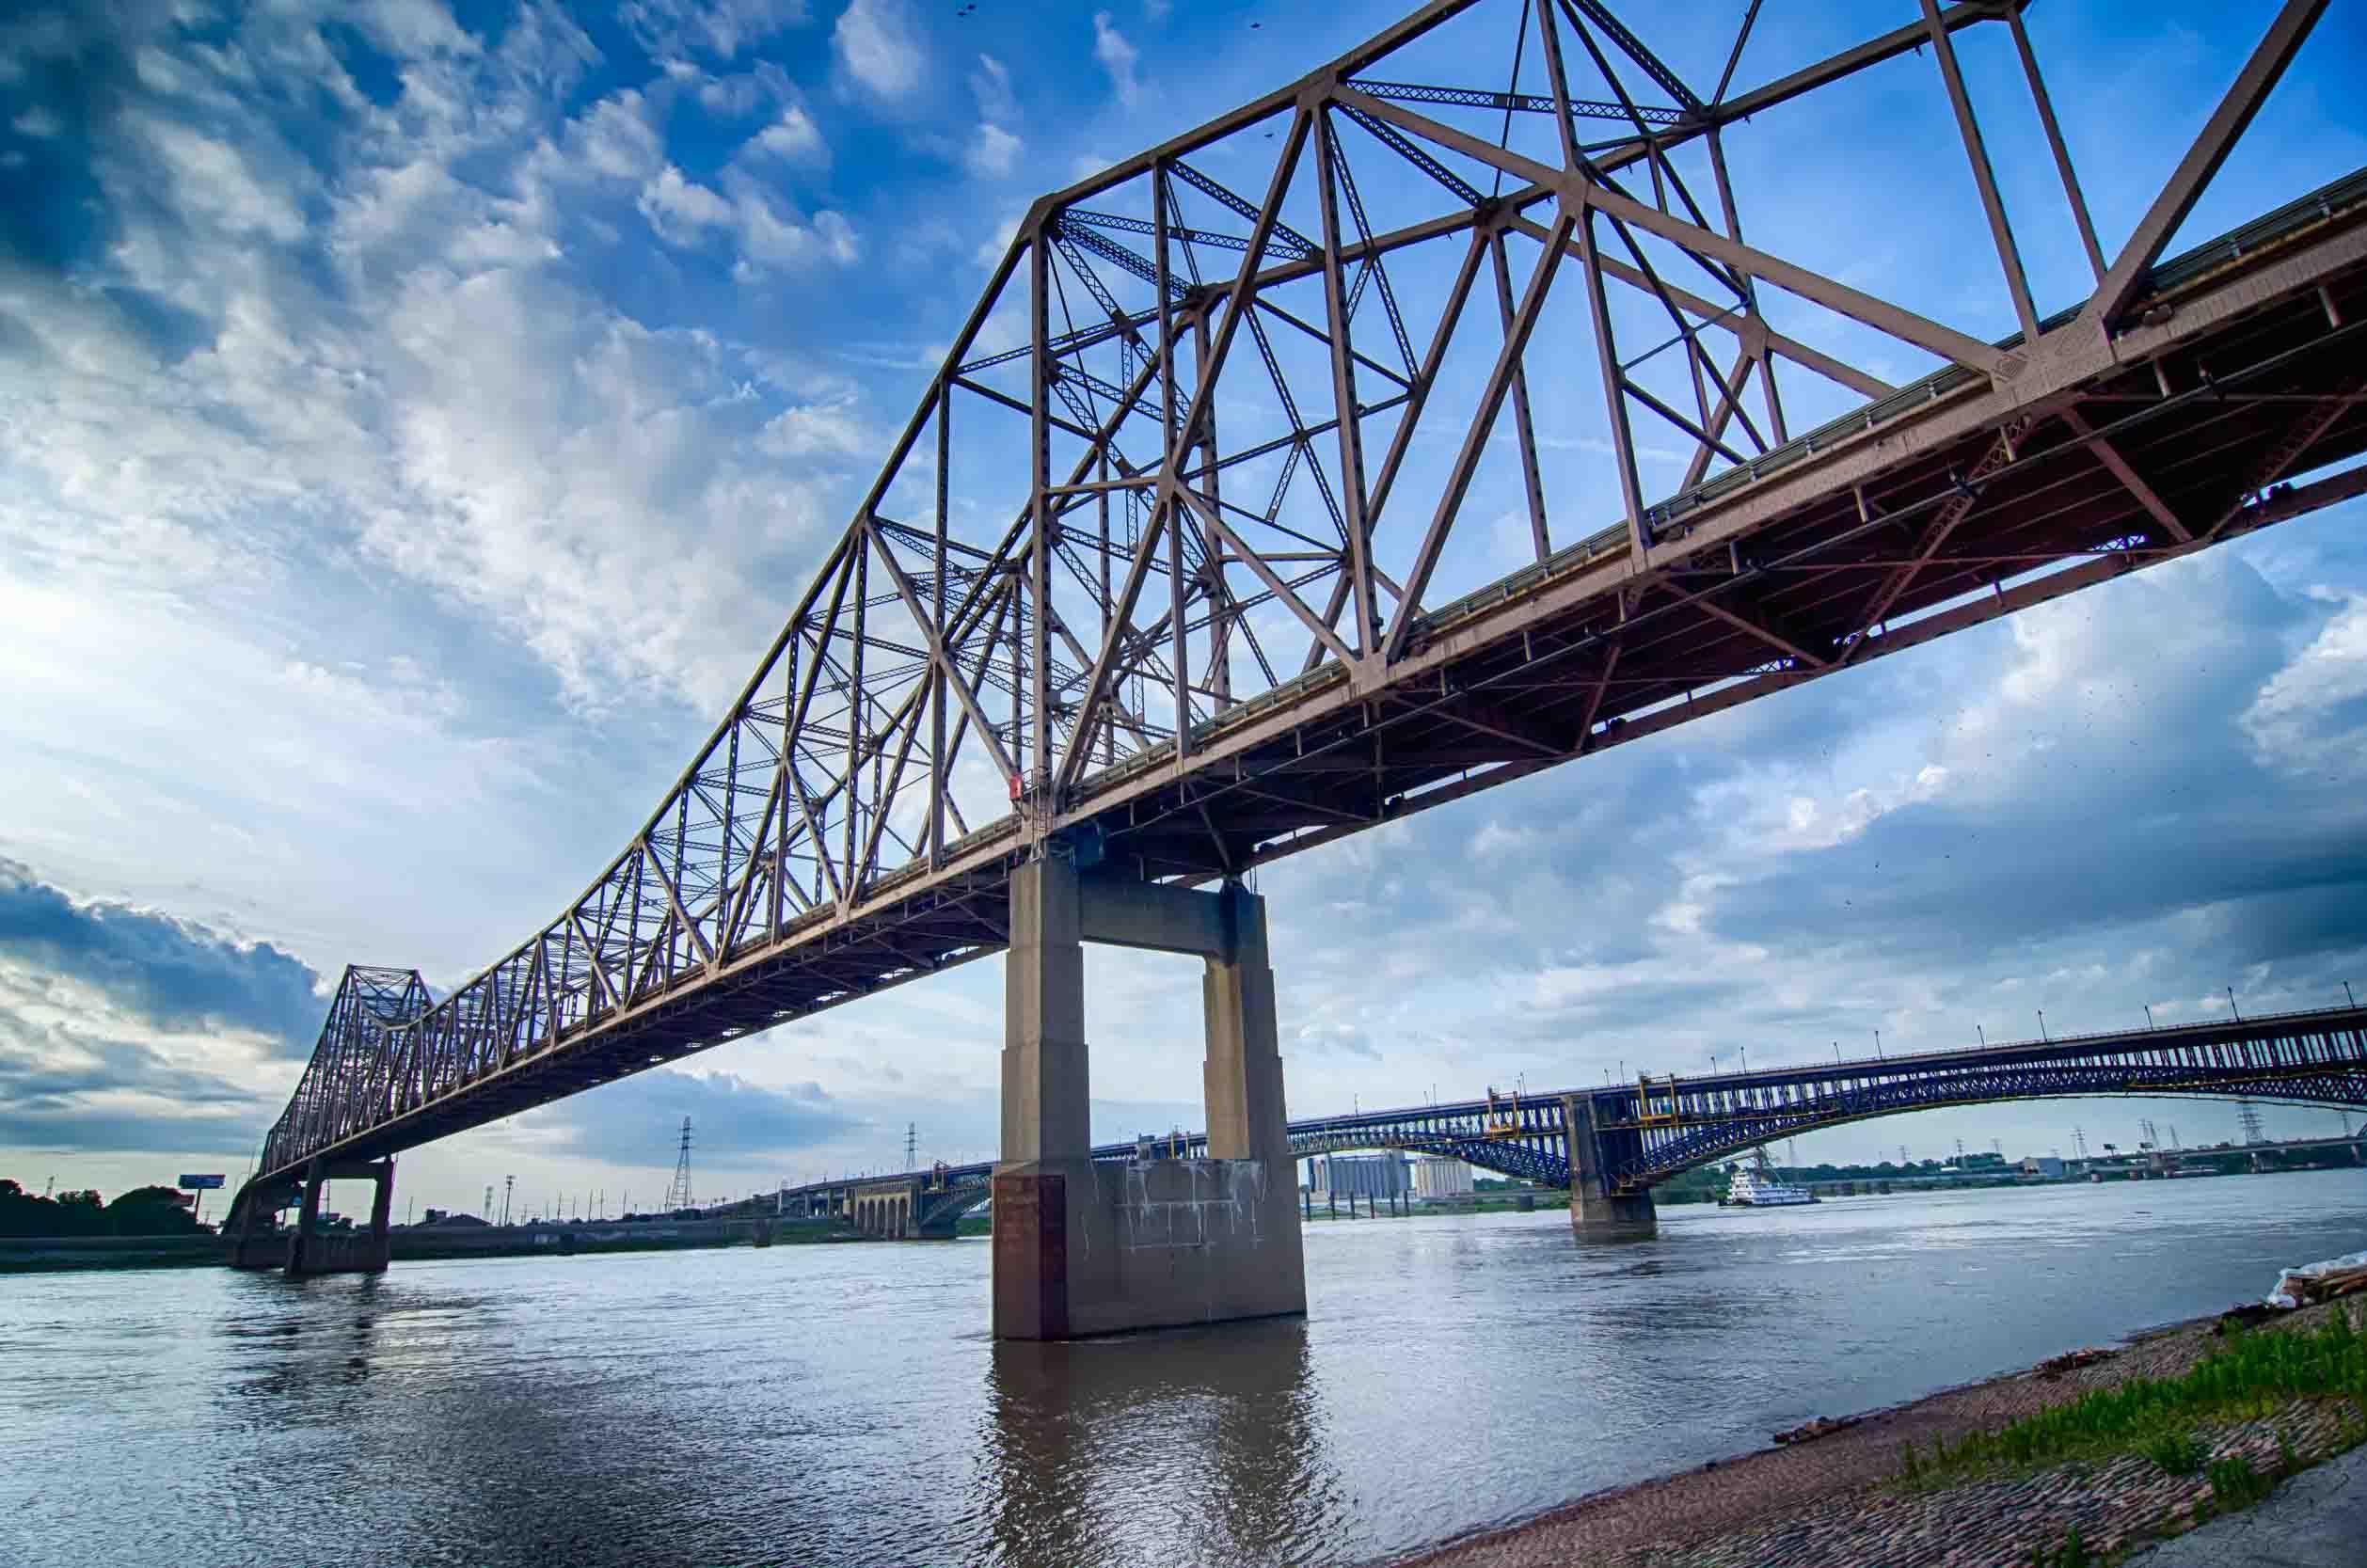 bridge-over-water-missouri-usa